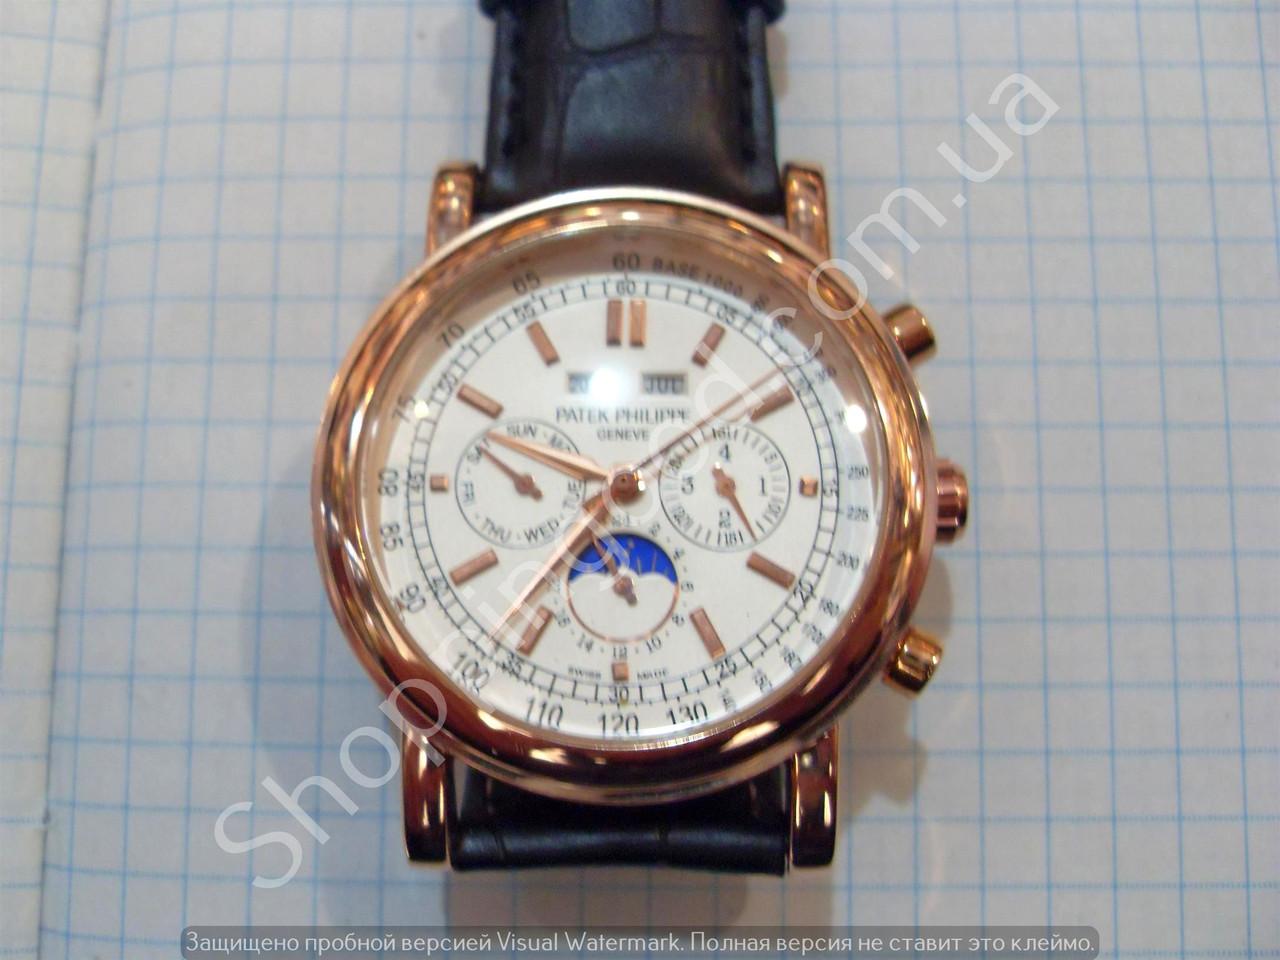 40b2f131 Механические часы Patek Philippe P72522 скелетон с автоподзаводом  золотистые на белом циферблате копия - Shoppingood в